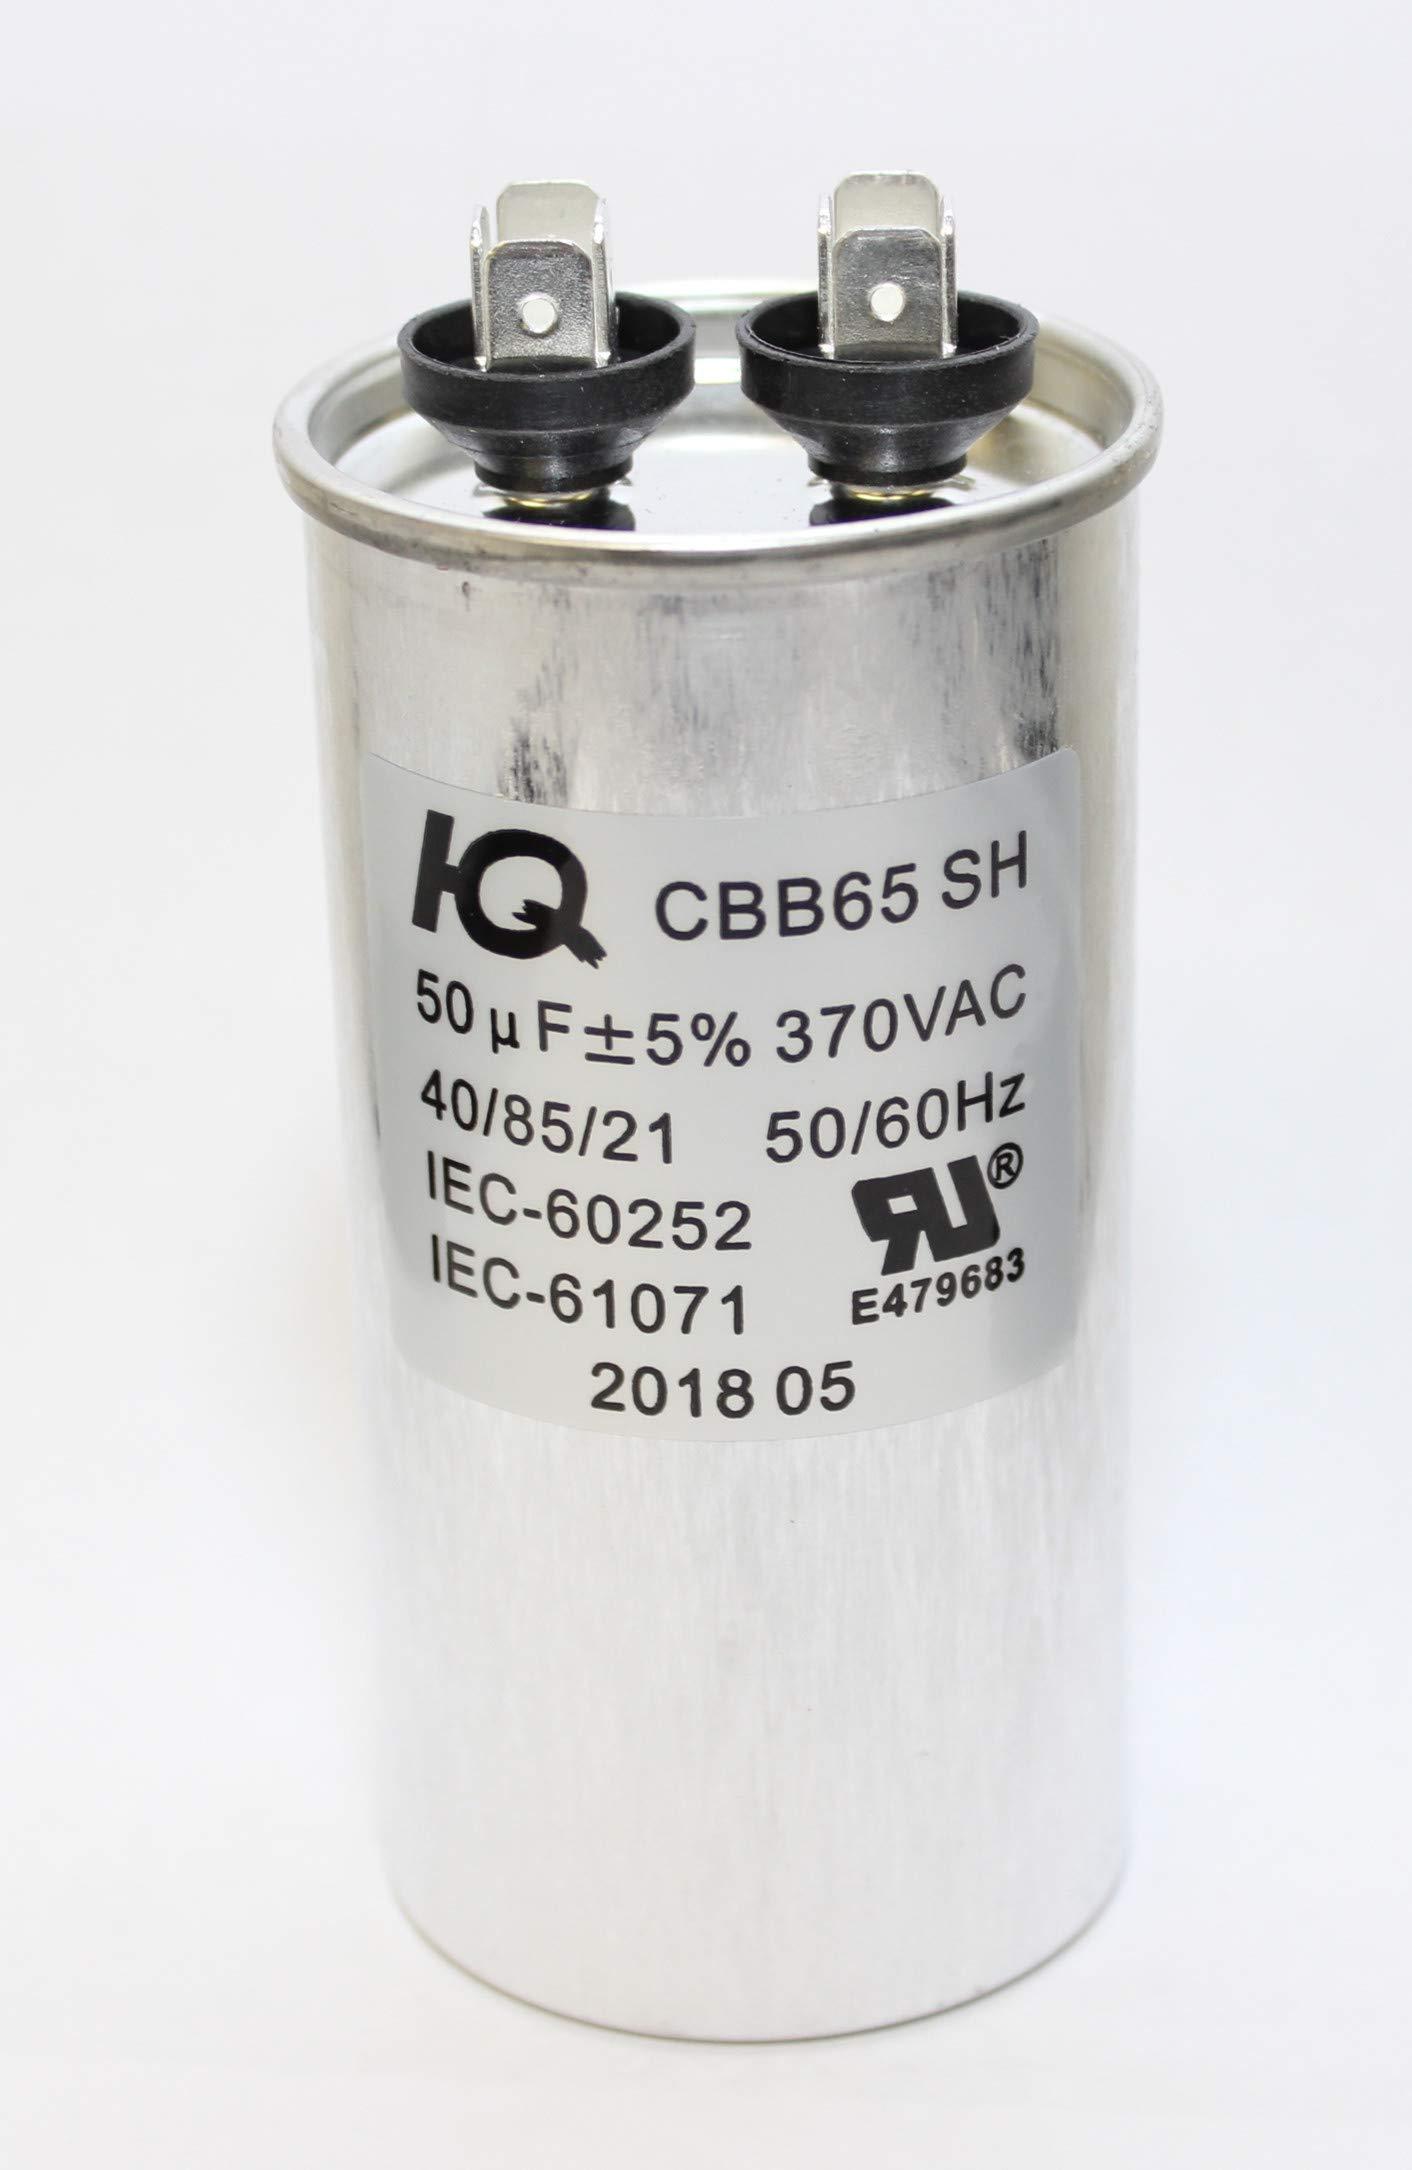 Galleon - QX6550 Capacitor Motor Run Round 50 UF MFD 370 V VAC Volt HVAC